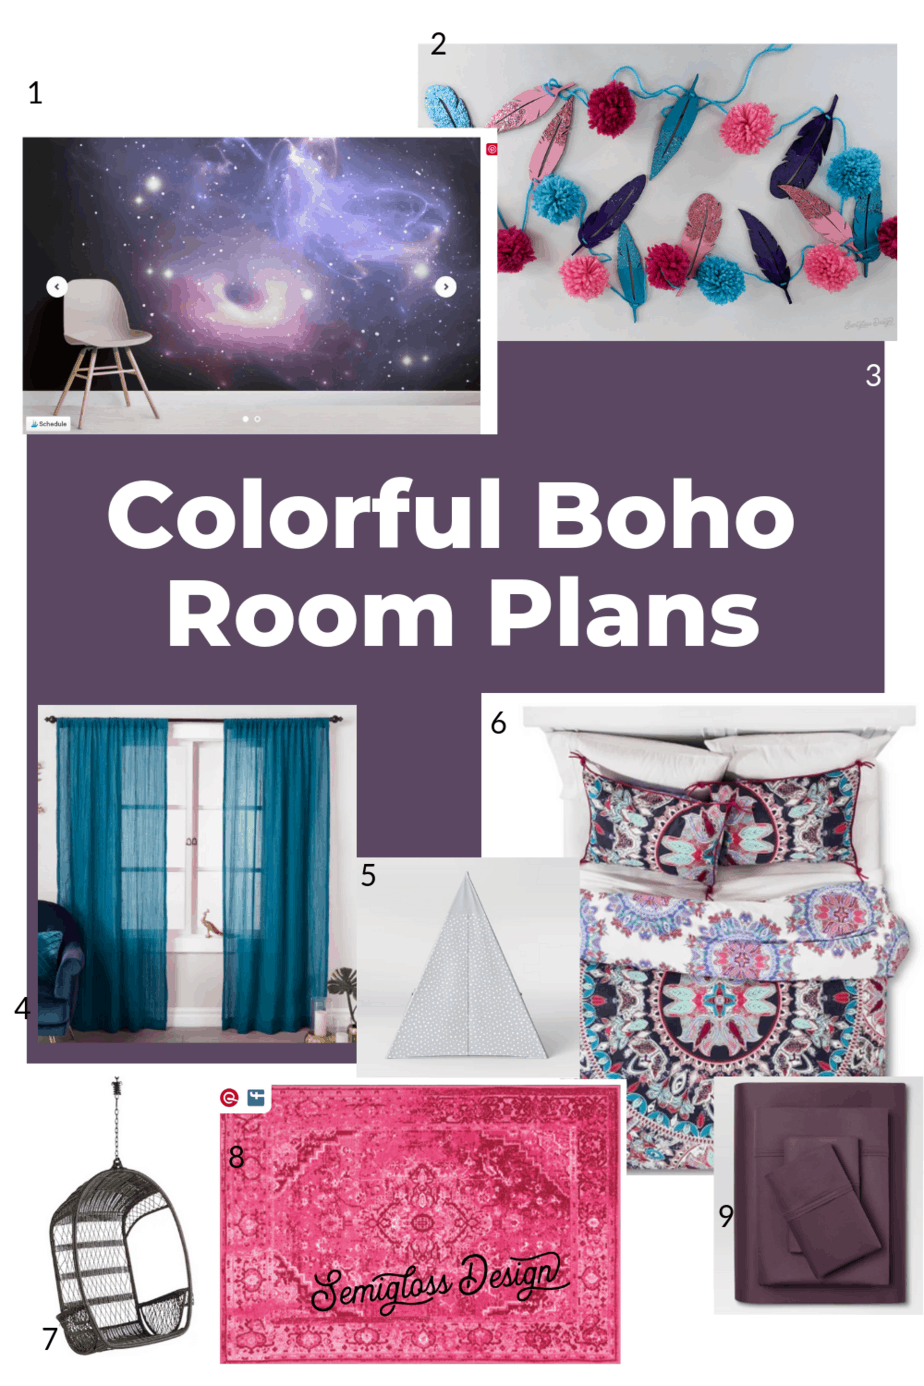 colorful boho bedroom plans